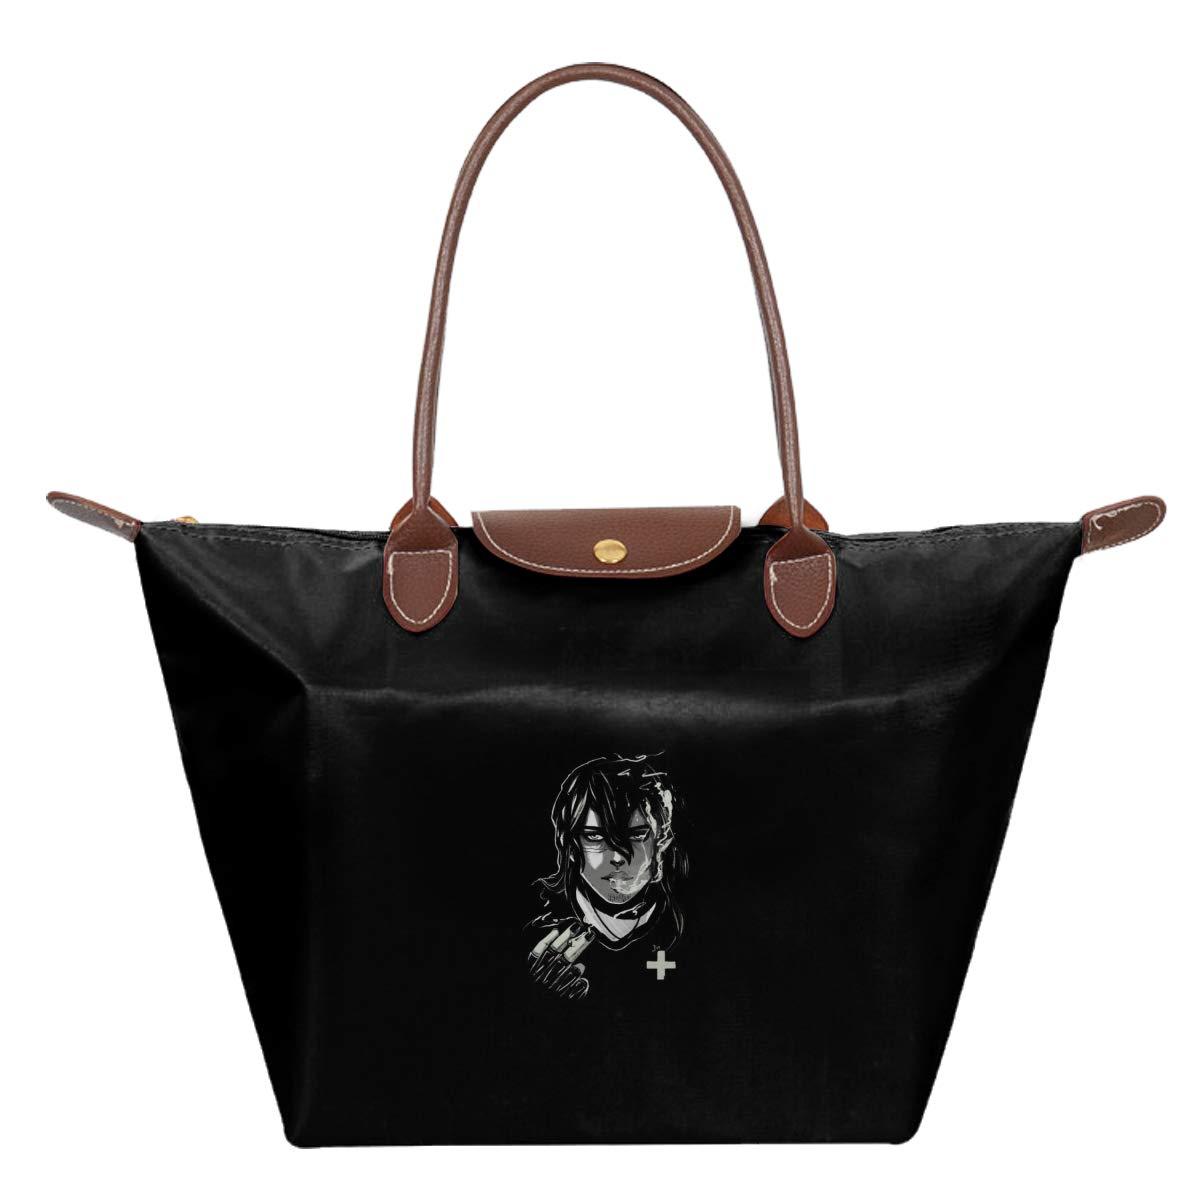 Aizawa Shota Black And White Waterproof Leather Folded Messenger Nylon Bag Travel Tote Hopping Folding School Handbags